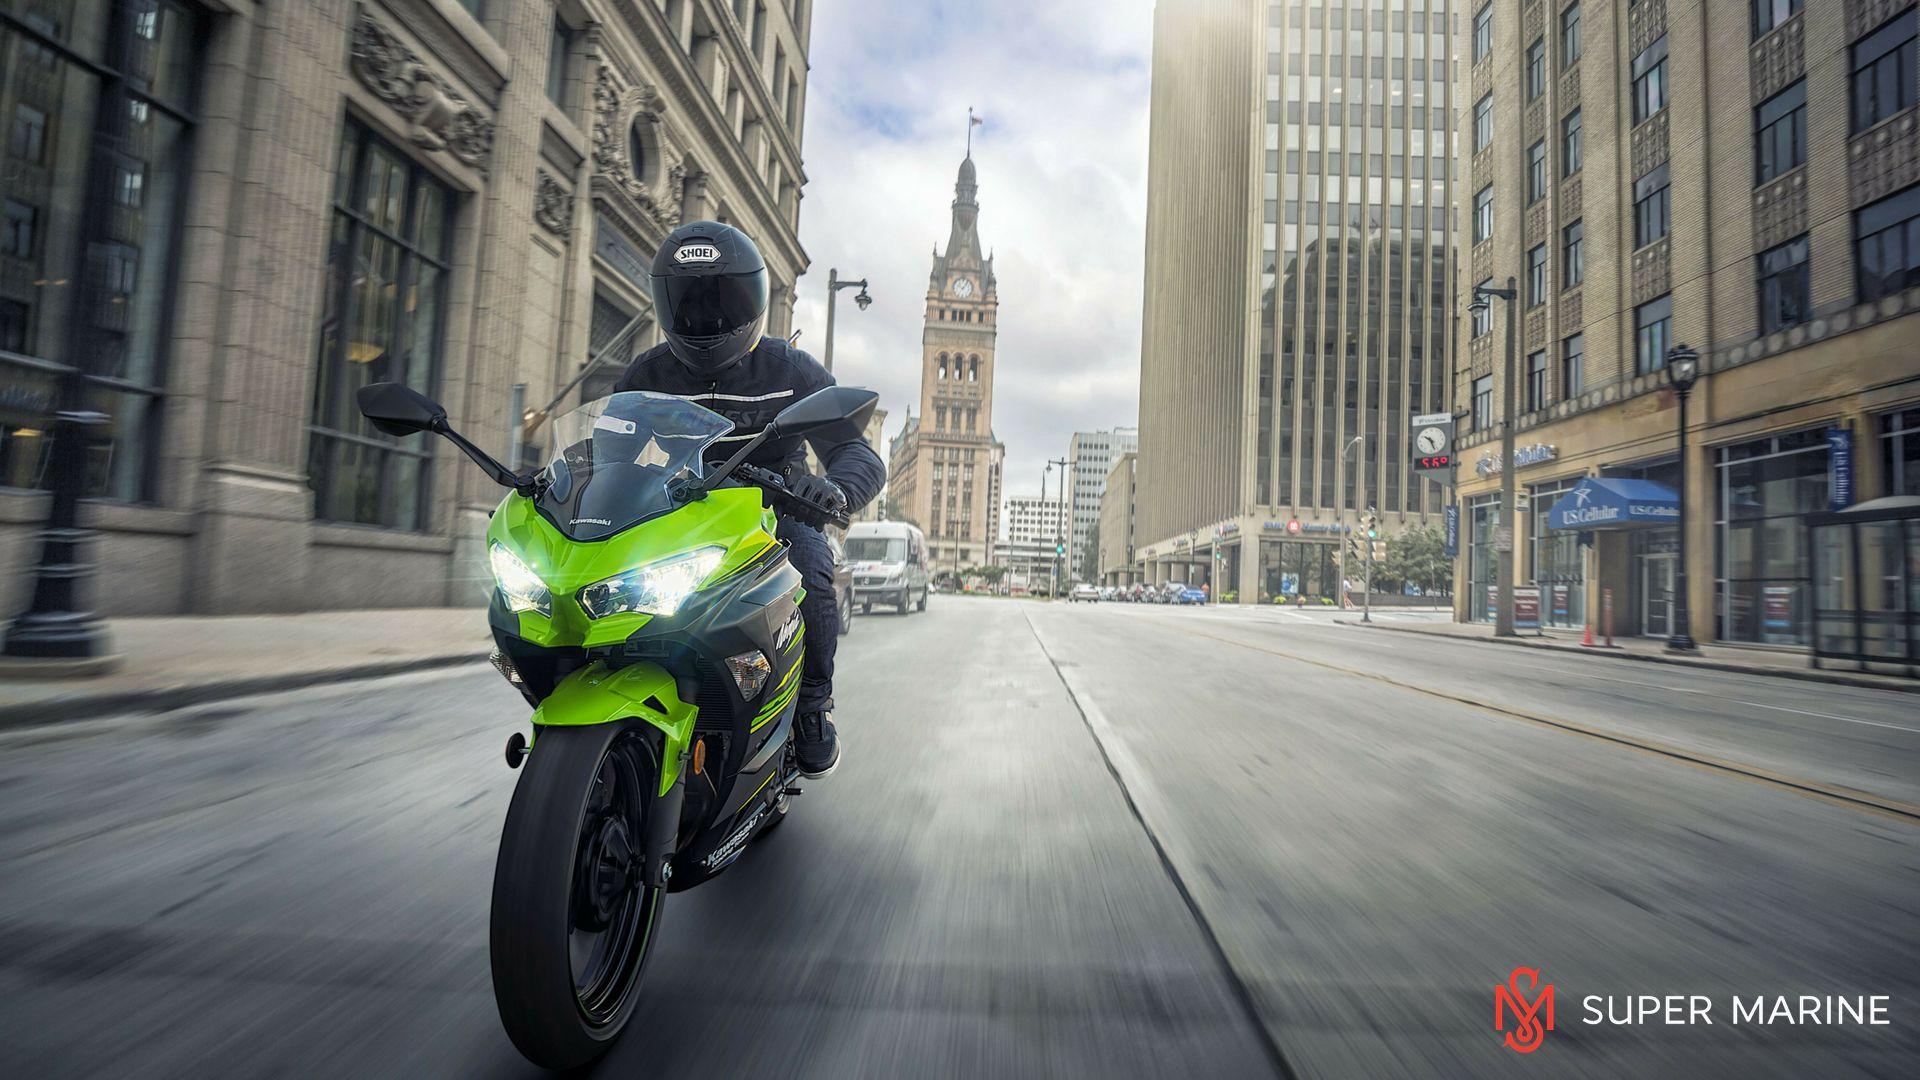 Мотоцикл Kawasaki Ninja 400 Зеленый 2020 - 13